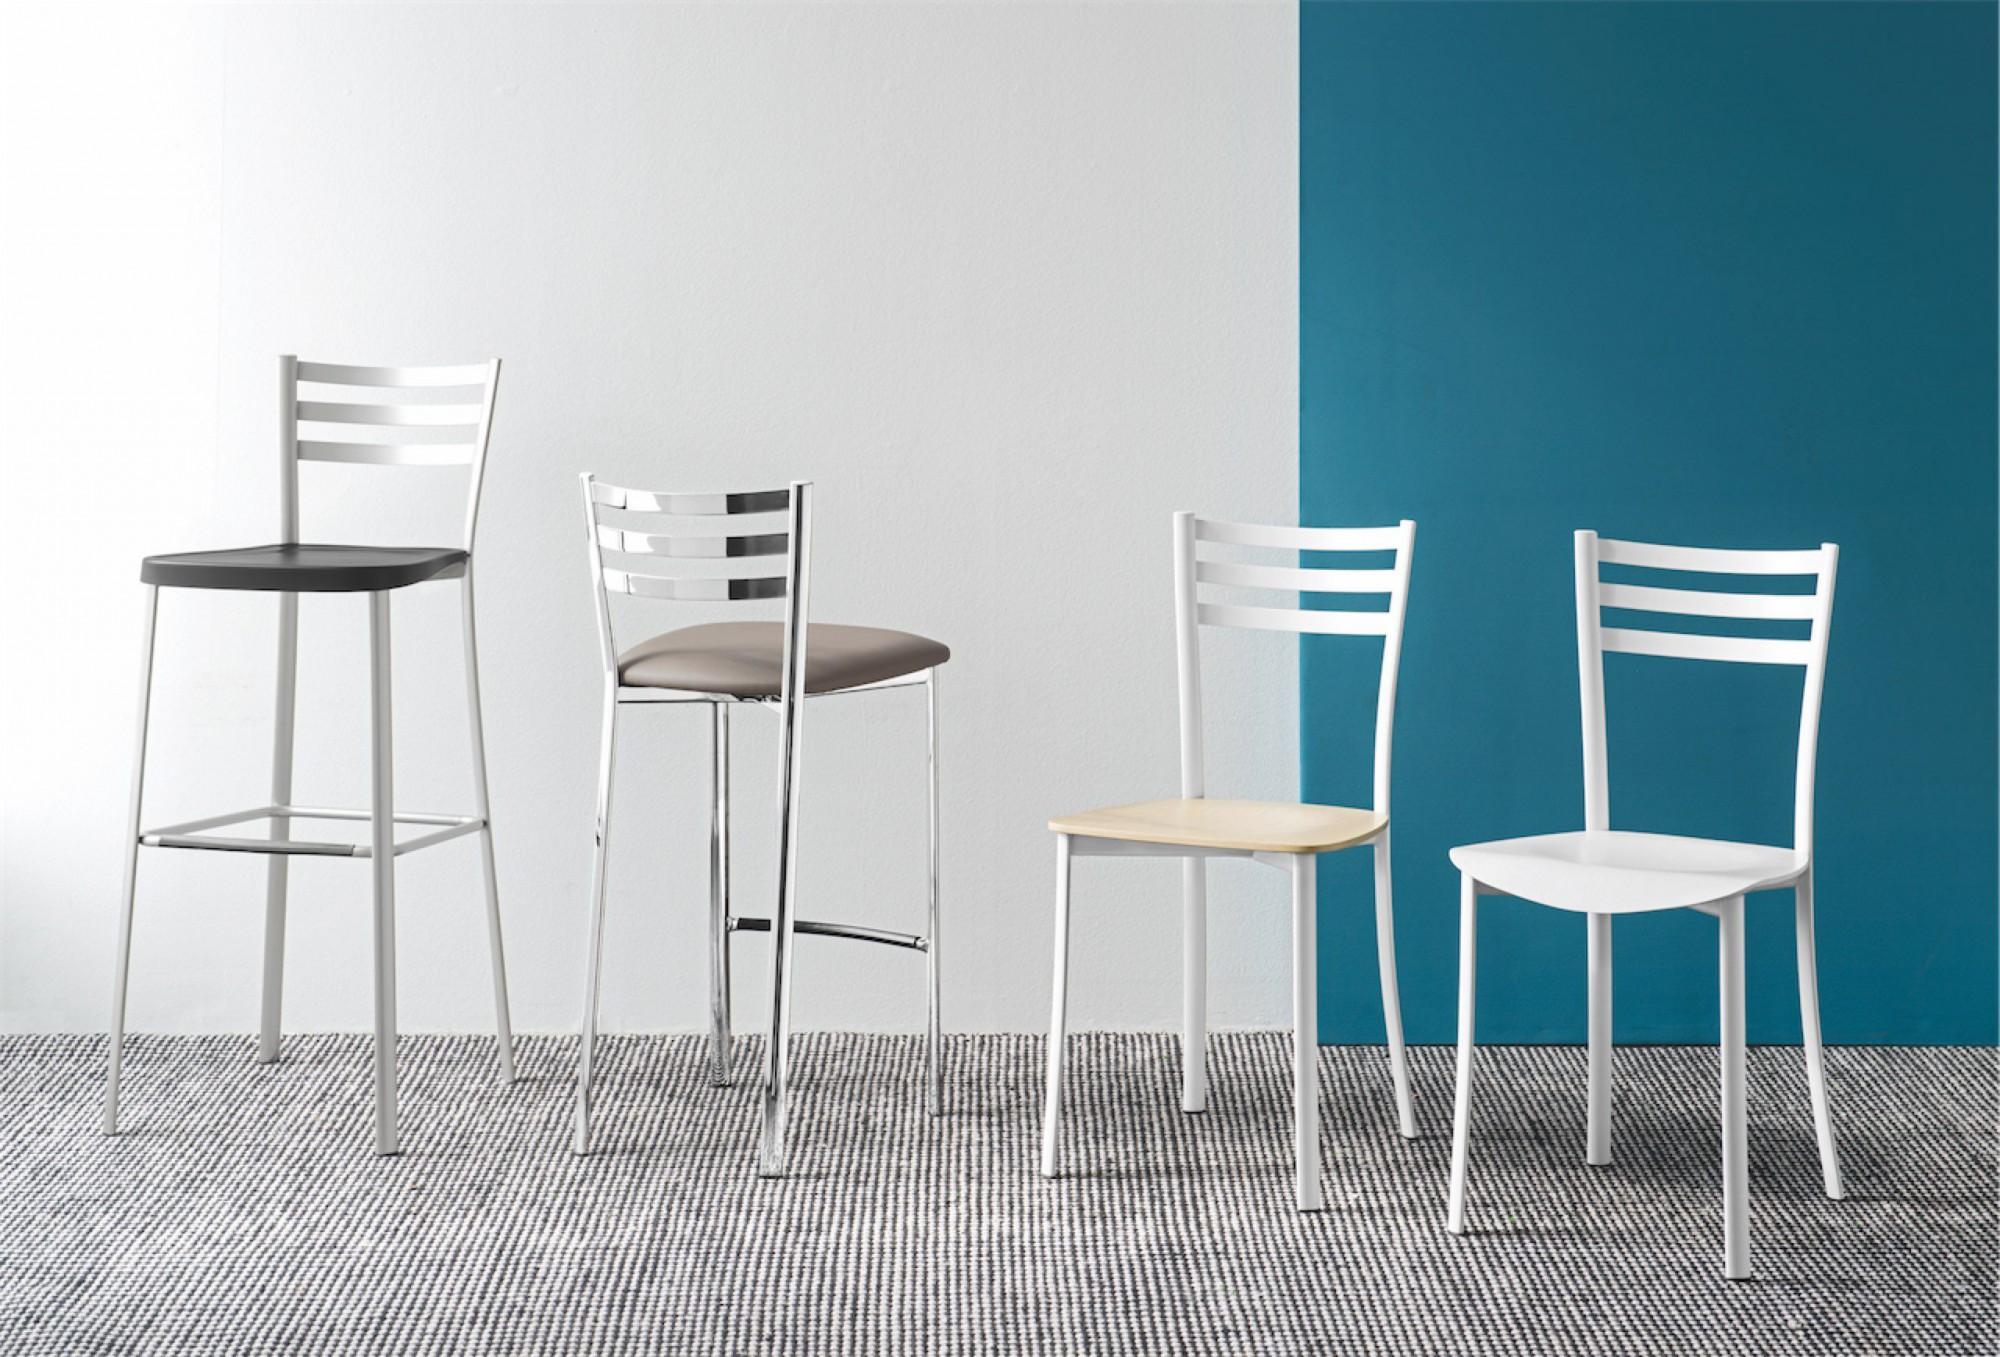 Sgabello ace o g calligaris da cucina in metallo fisso ideal sedia